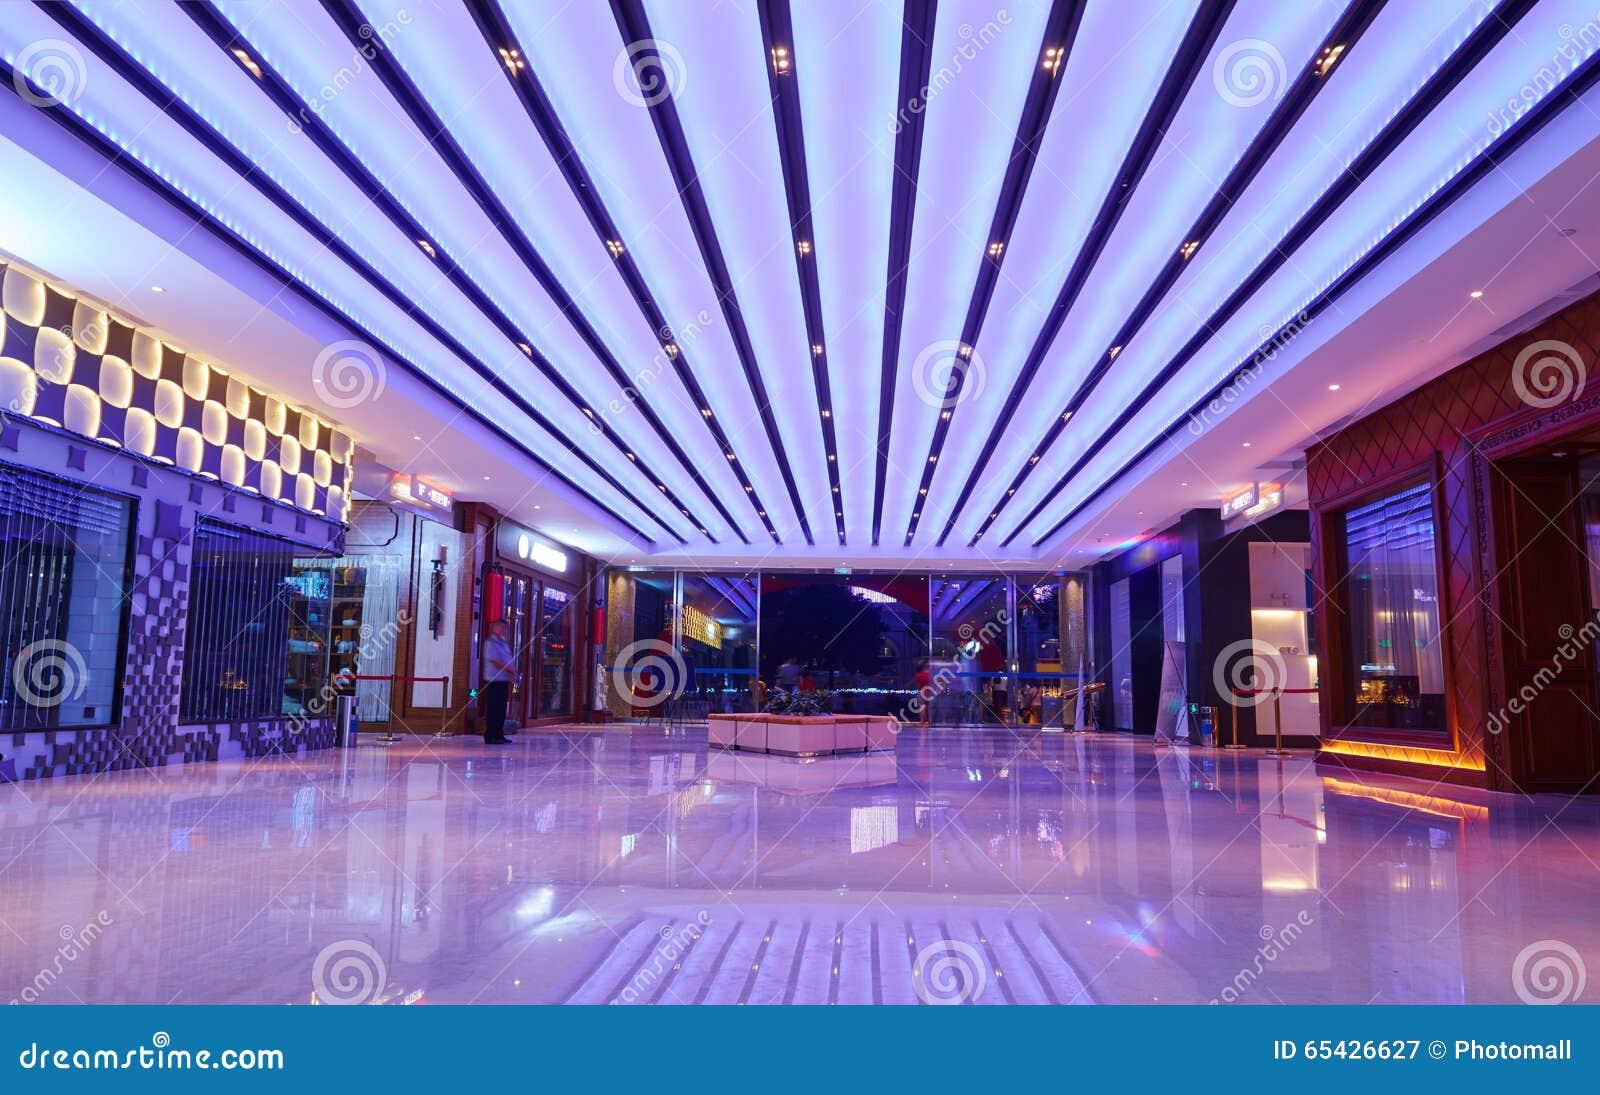 Shopping mall lobby led ceiling lighting